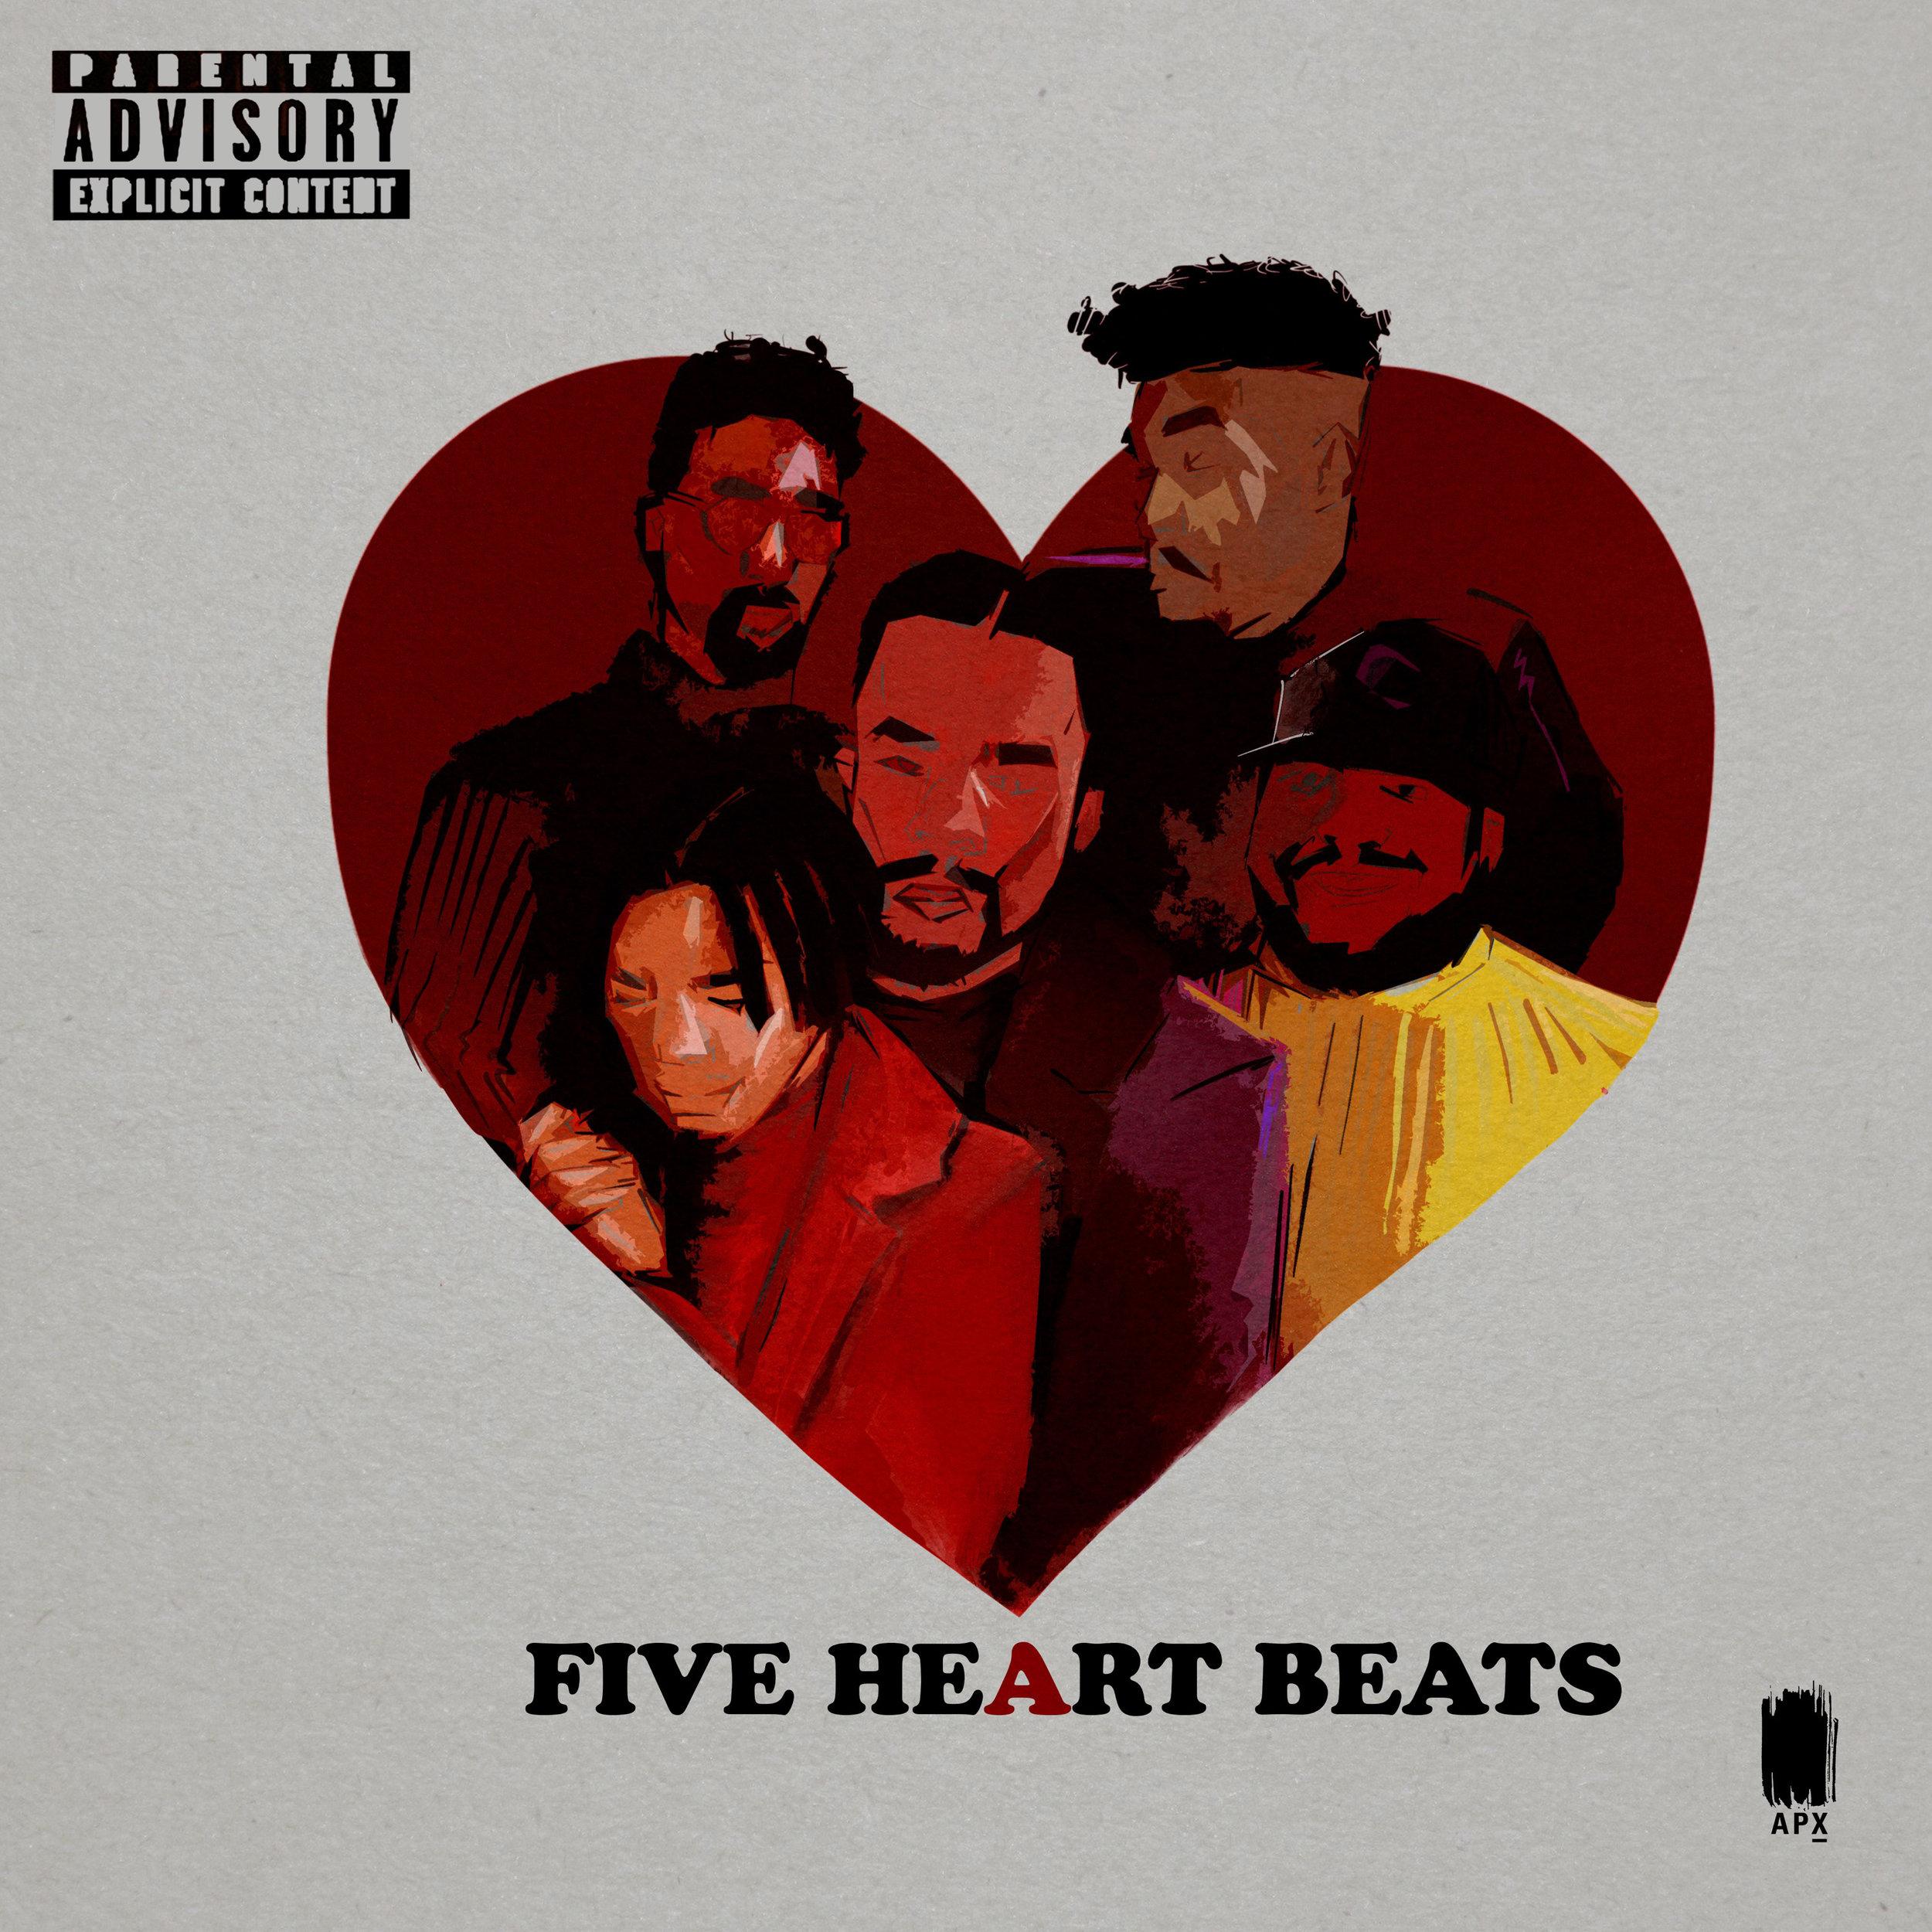 5 Heartbeats Ft. Yung Tact, Orlando Coolridge, Mani Jurdan, W.ILL, & Earn Money (Prod. By Seydina)